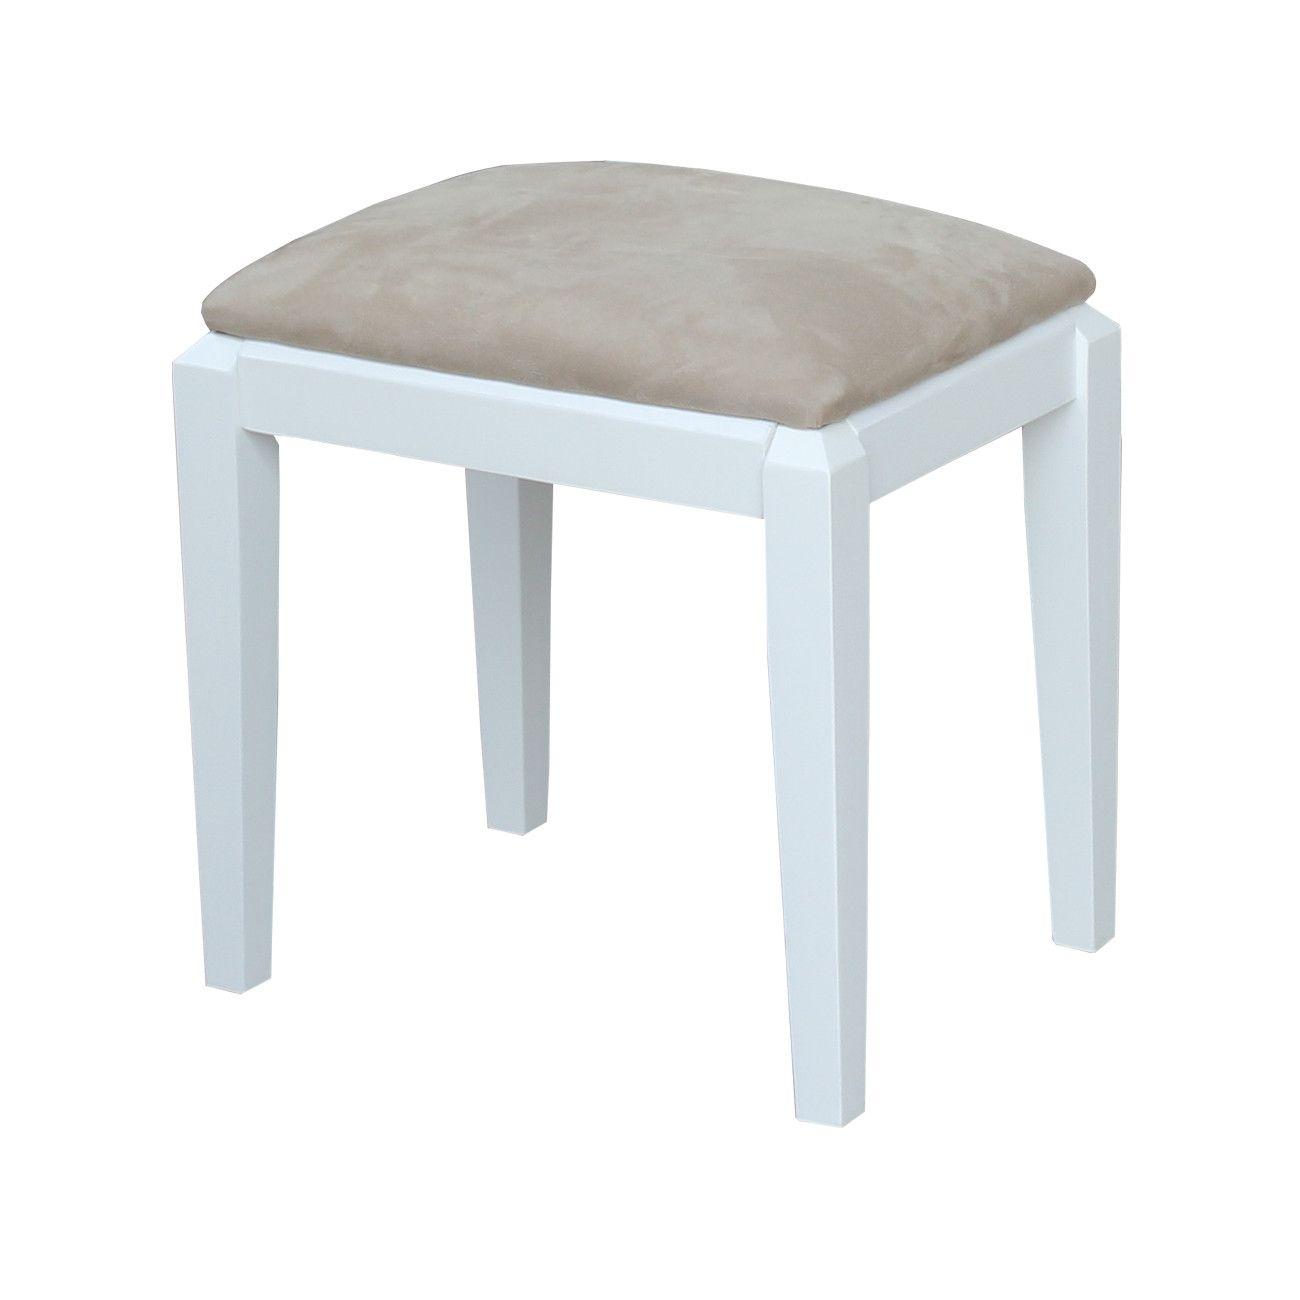 Andalusia vanity stool vanity stool andalusia and stools